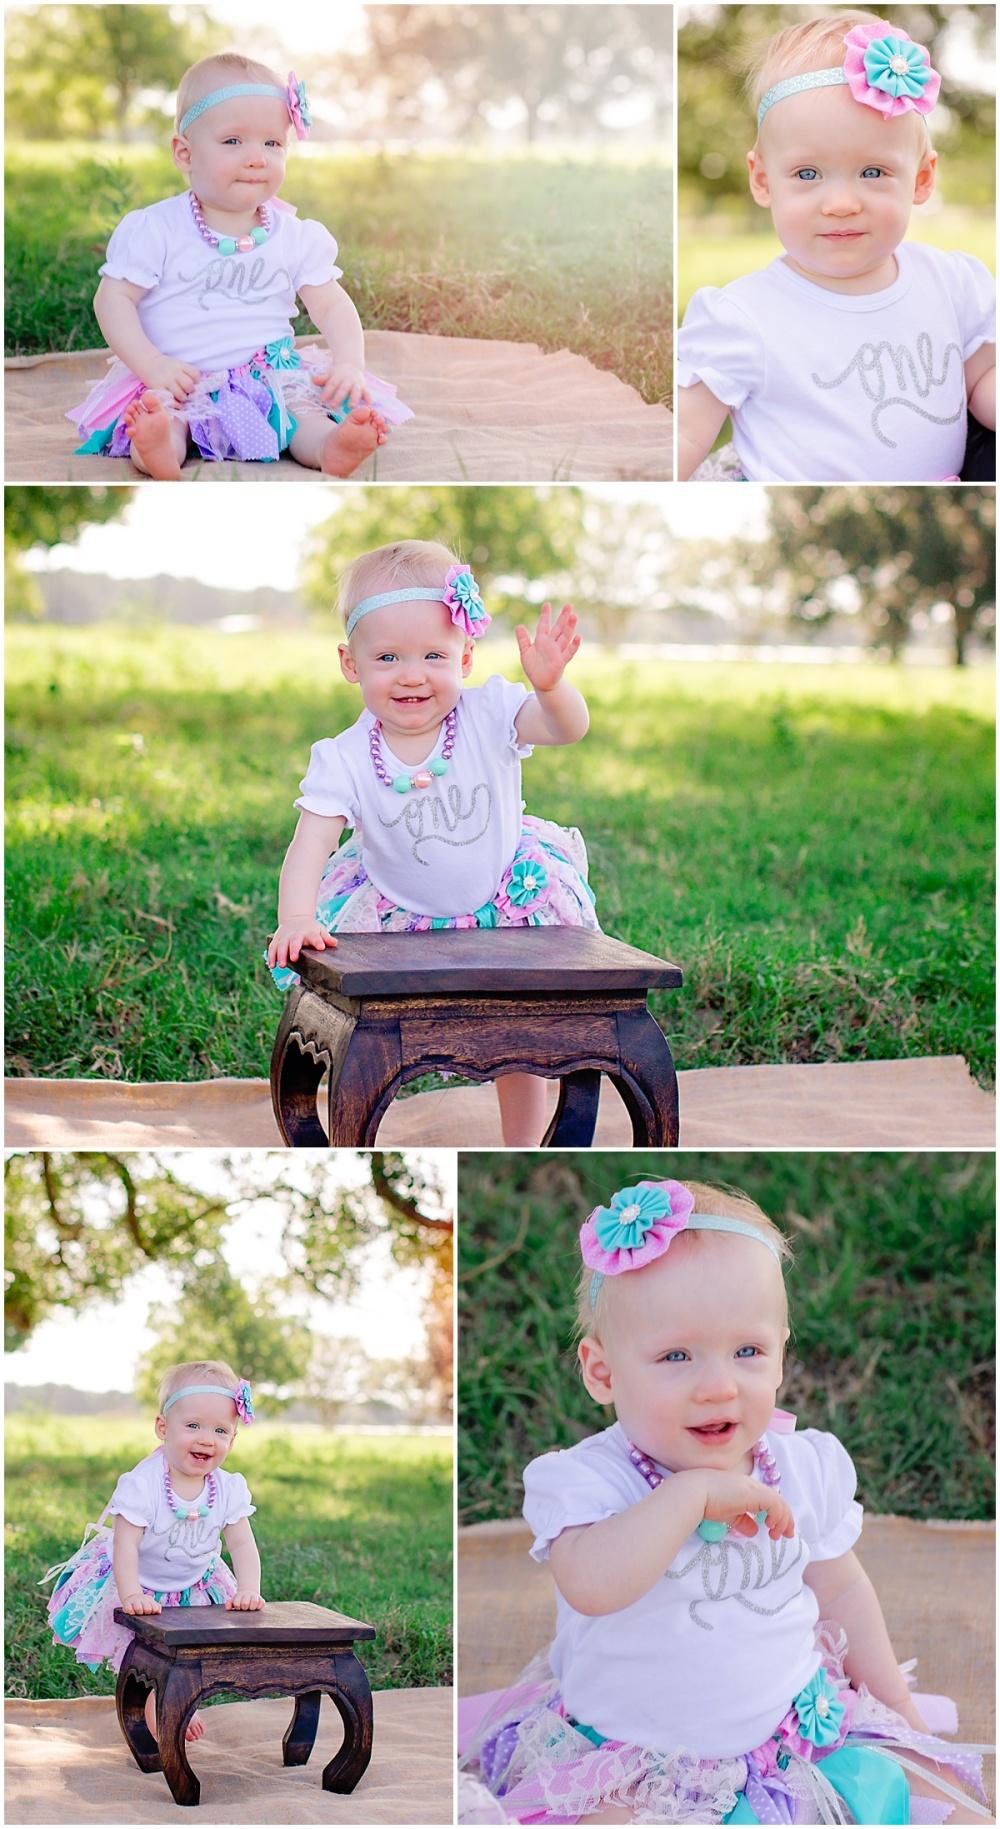 Family-Children-Portraits-Cake-Smash-Photos-San-Antonio-Hill-Country-Texas-Carly-Barton-Photography_0002.jpg